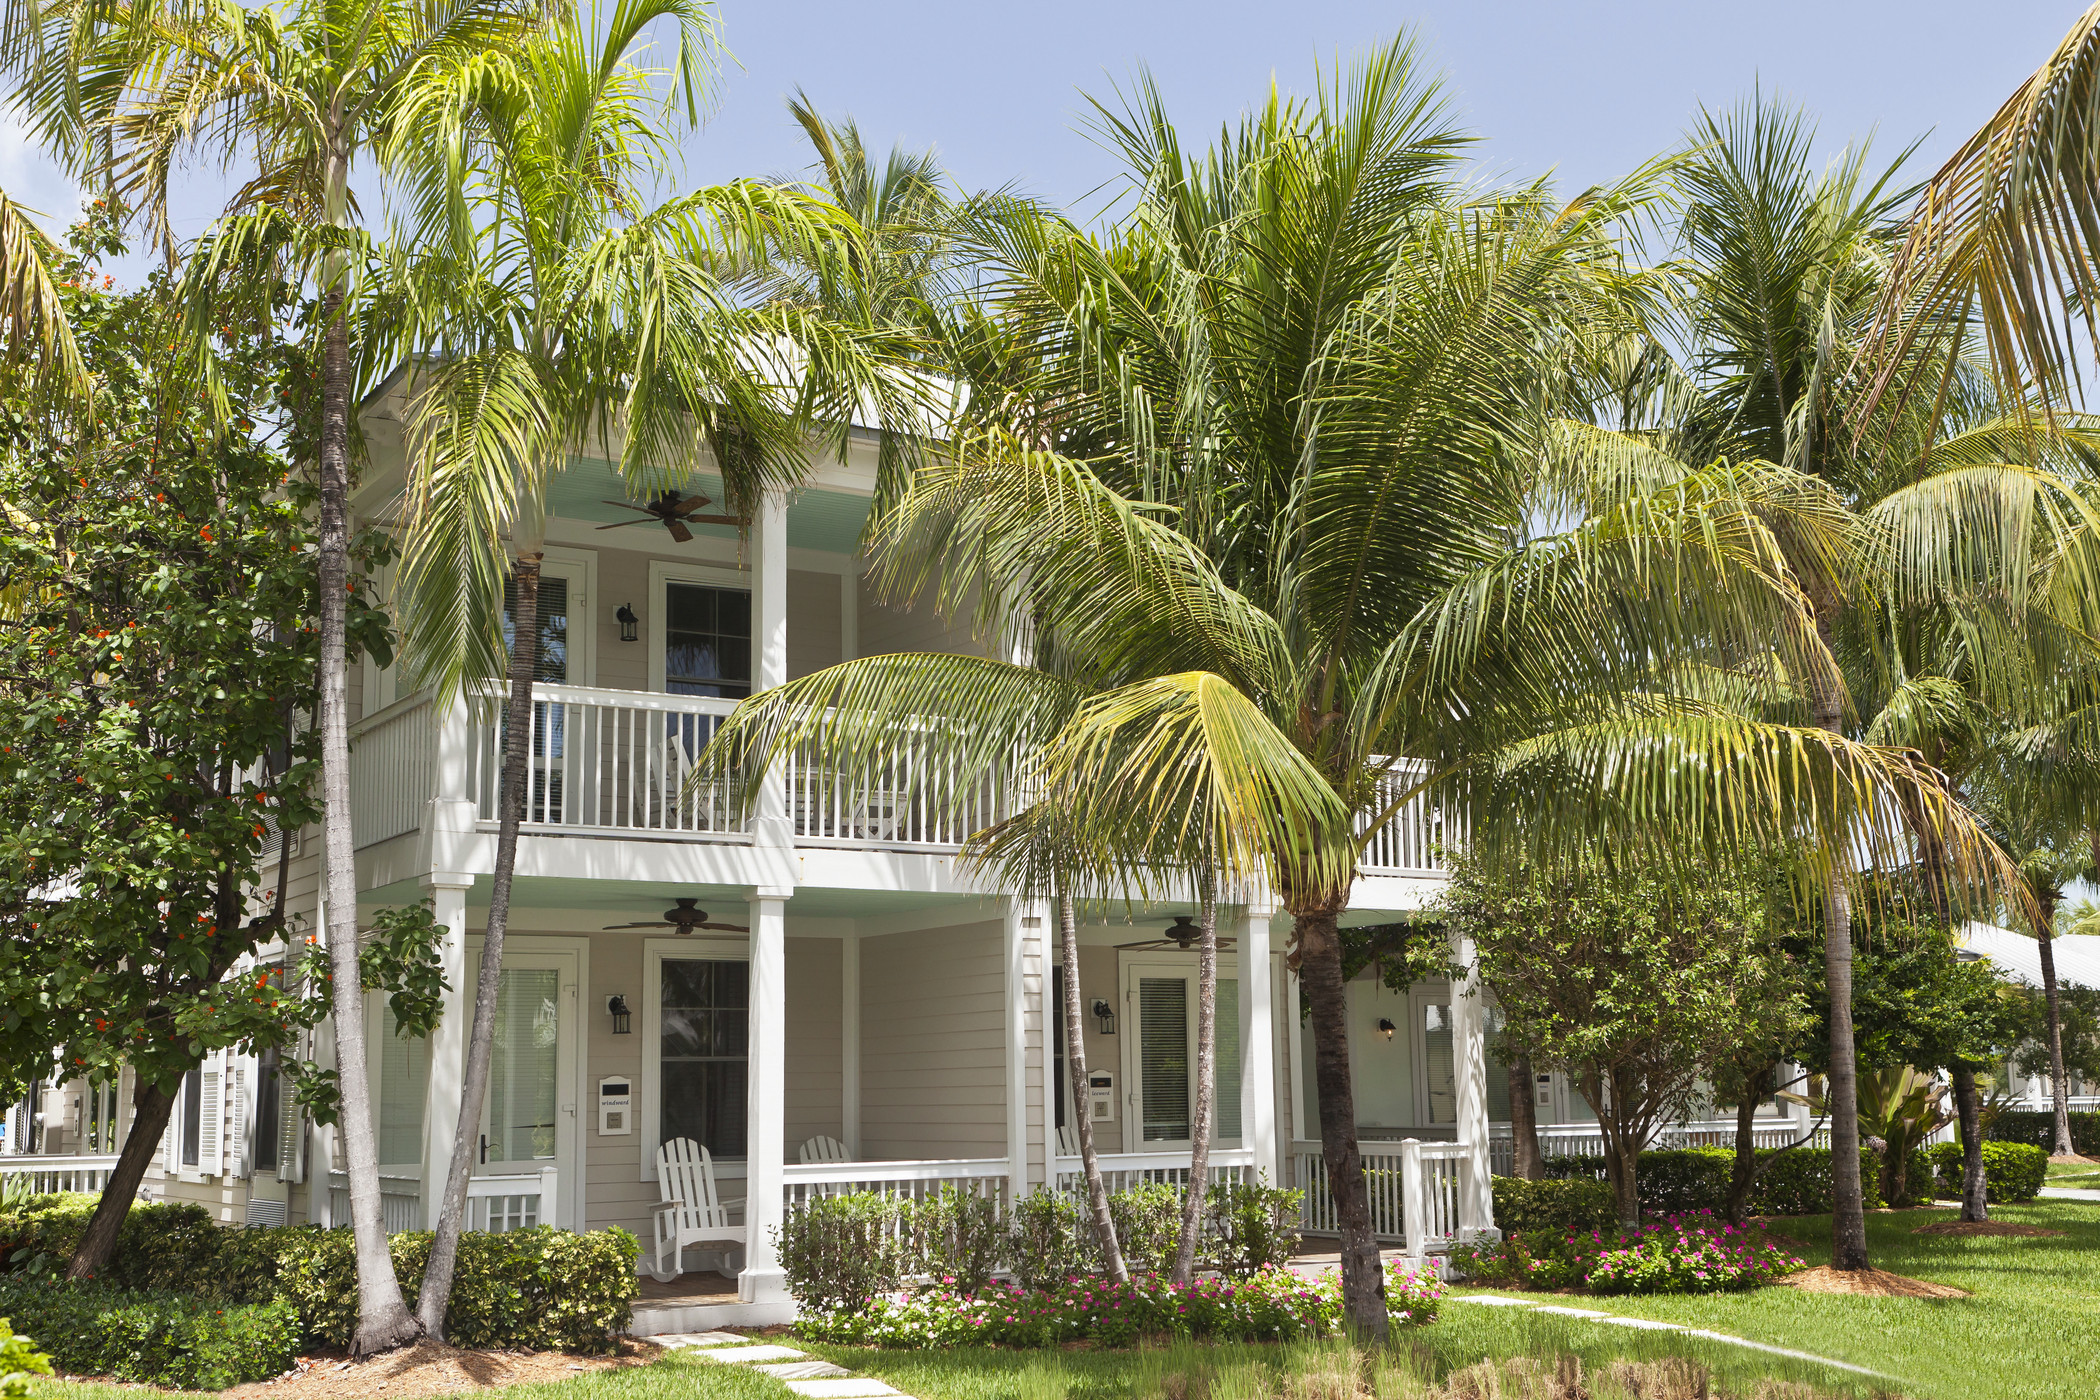 Luxury Collection Hotels Resorts Katie Roberts 212 380 4049 Starwoodhotels